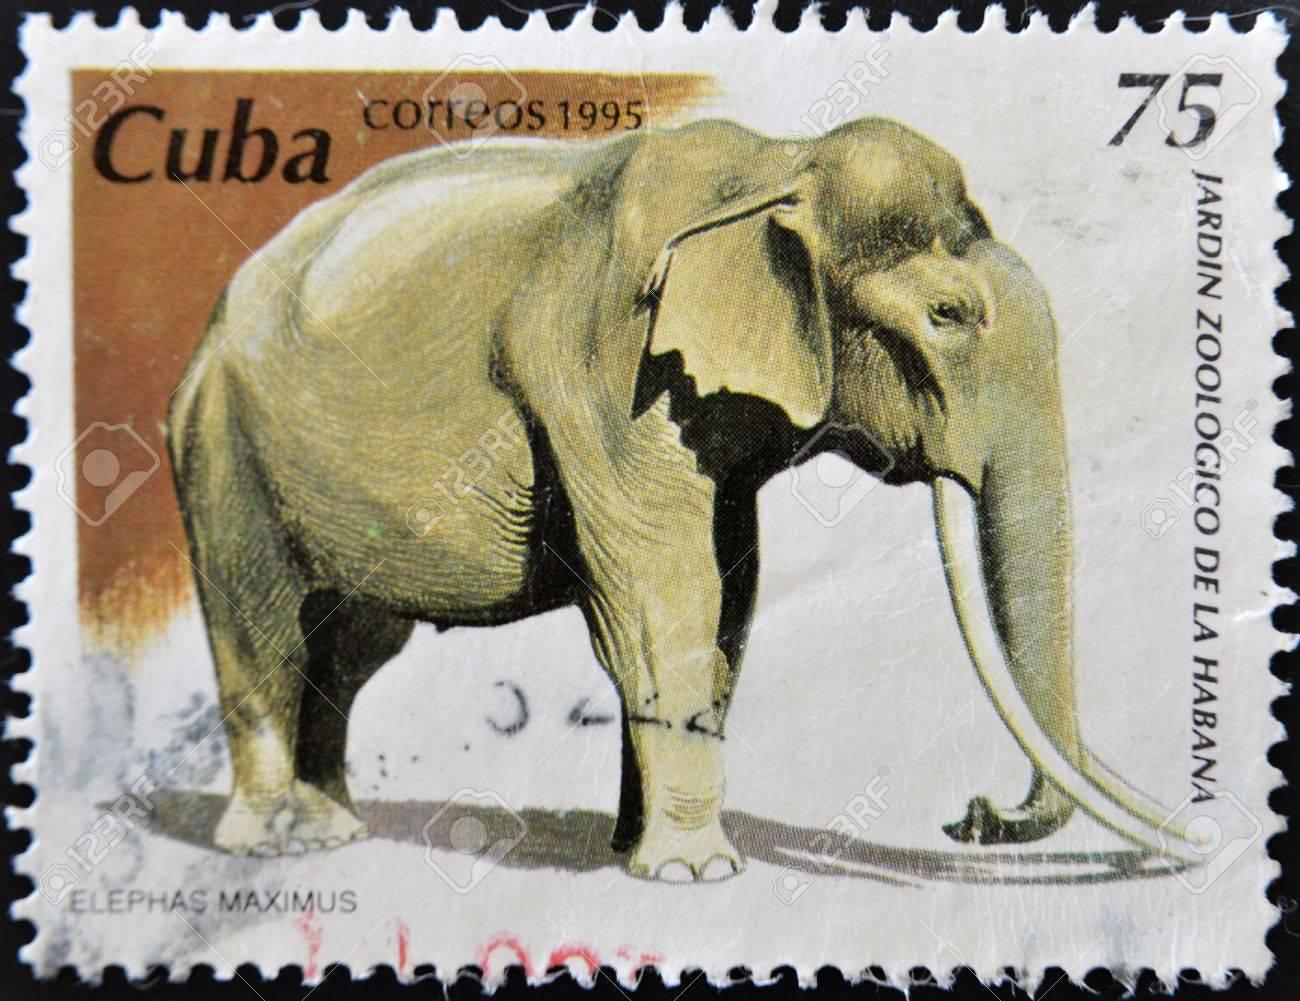 CUBA - CIRCA 1995: A stamp printed in Cuba dedicated to the Havana Zoo, shows a elephant maximus, circa 1995 Stock Photo - 11139857